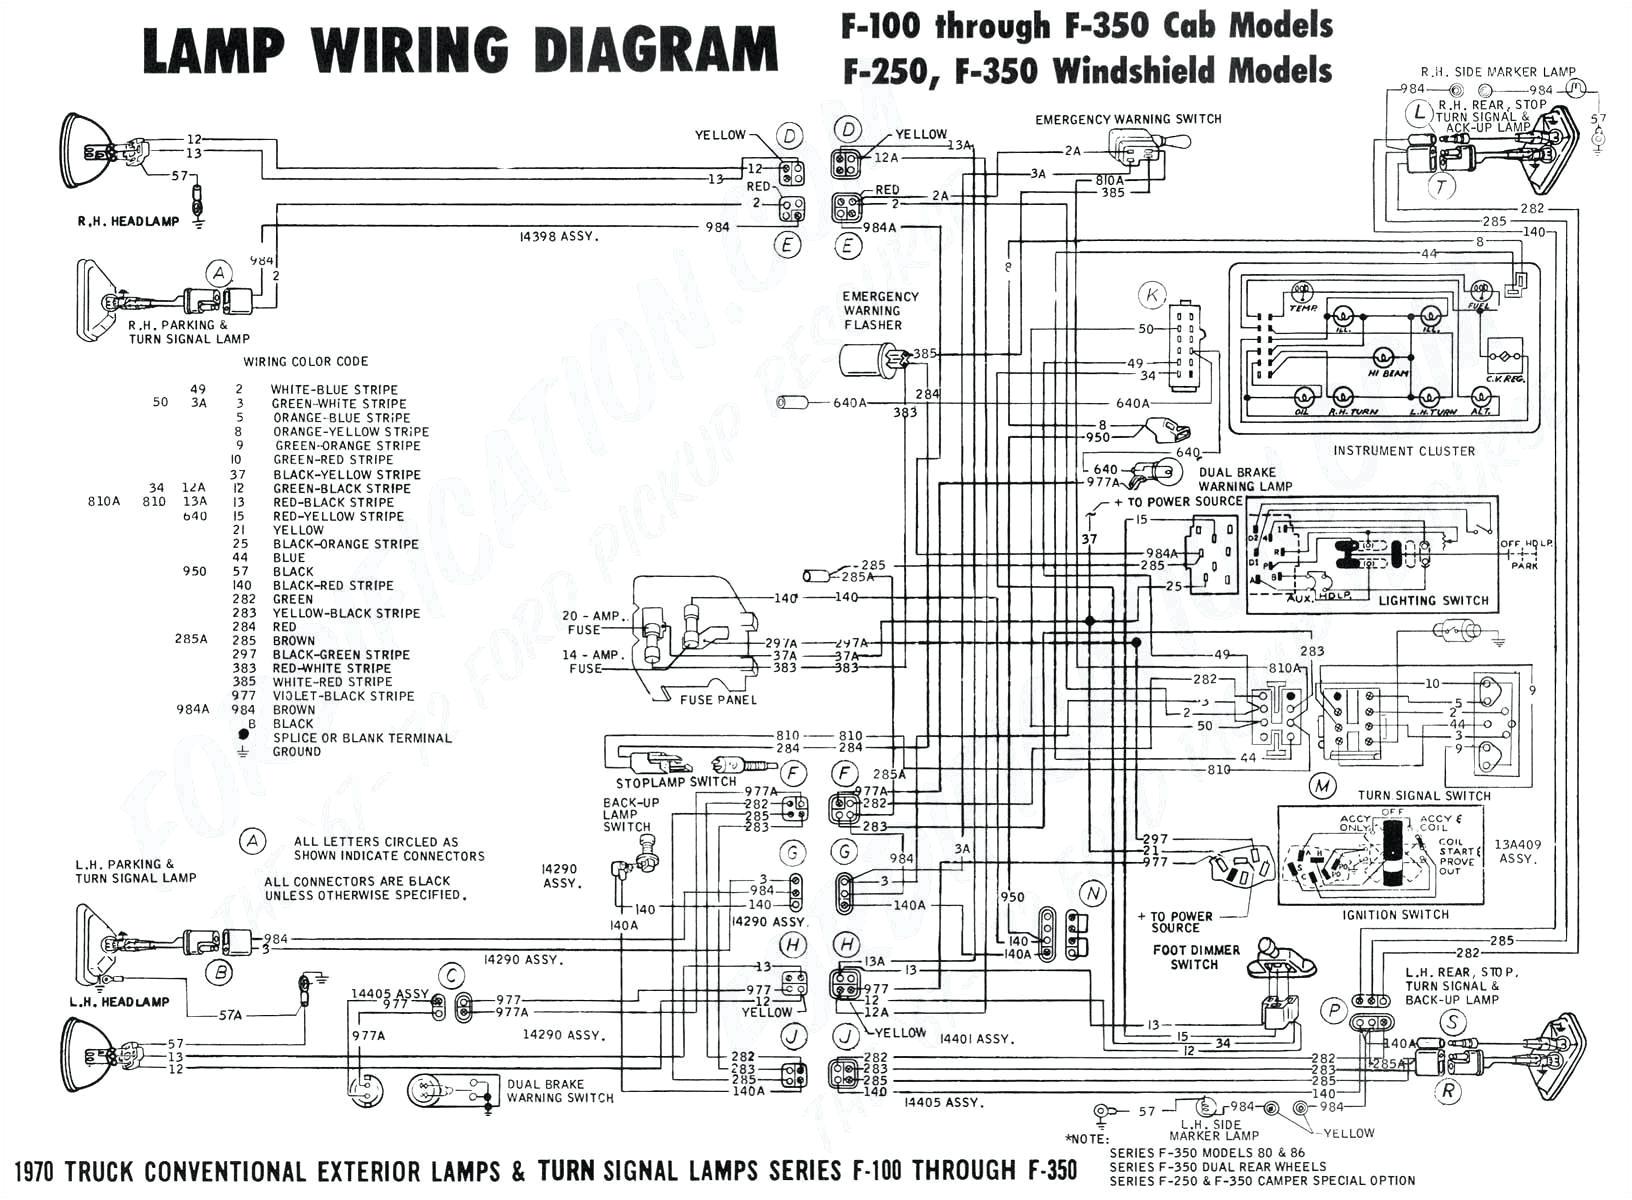 1997 ford f 150 transmission wiring harness wiring diagram datasource 1997 ford f150 wiring harness diagram 1997 f150 wiring harness diagram